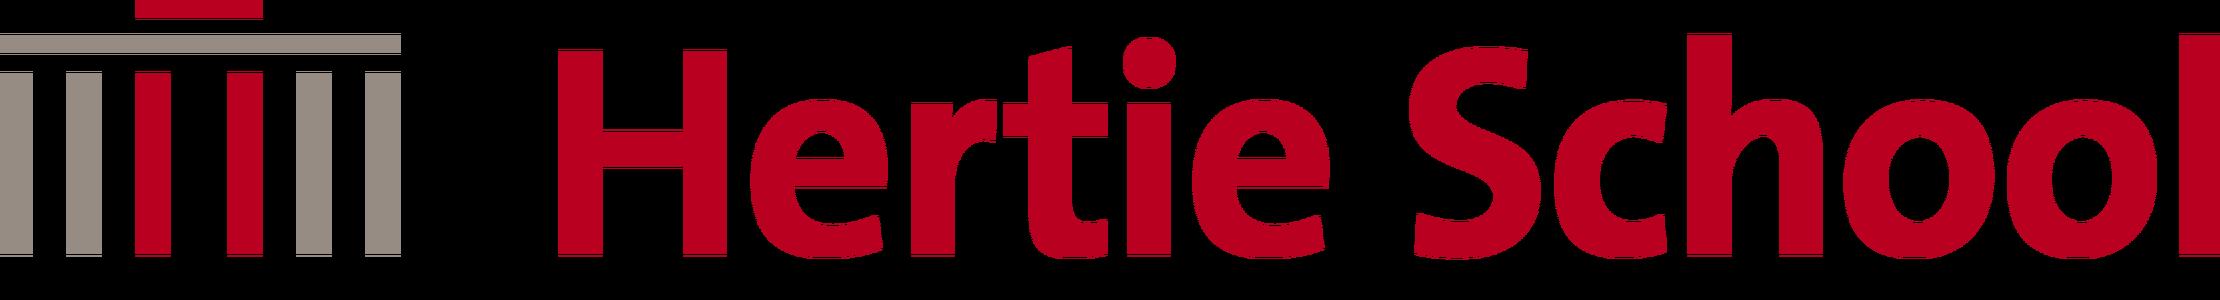 Postdoctoral Researcher Energy Policy (f/m/div) - Hertie School gGmbH - Logo